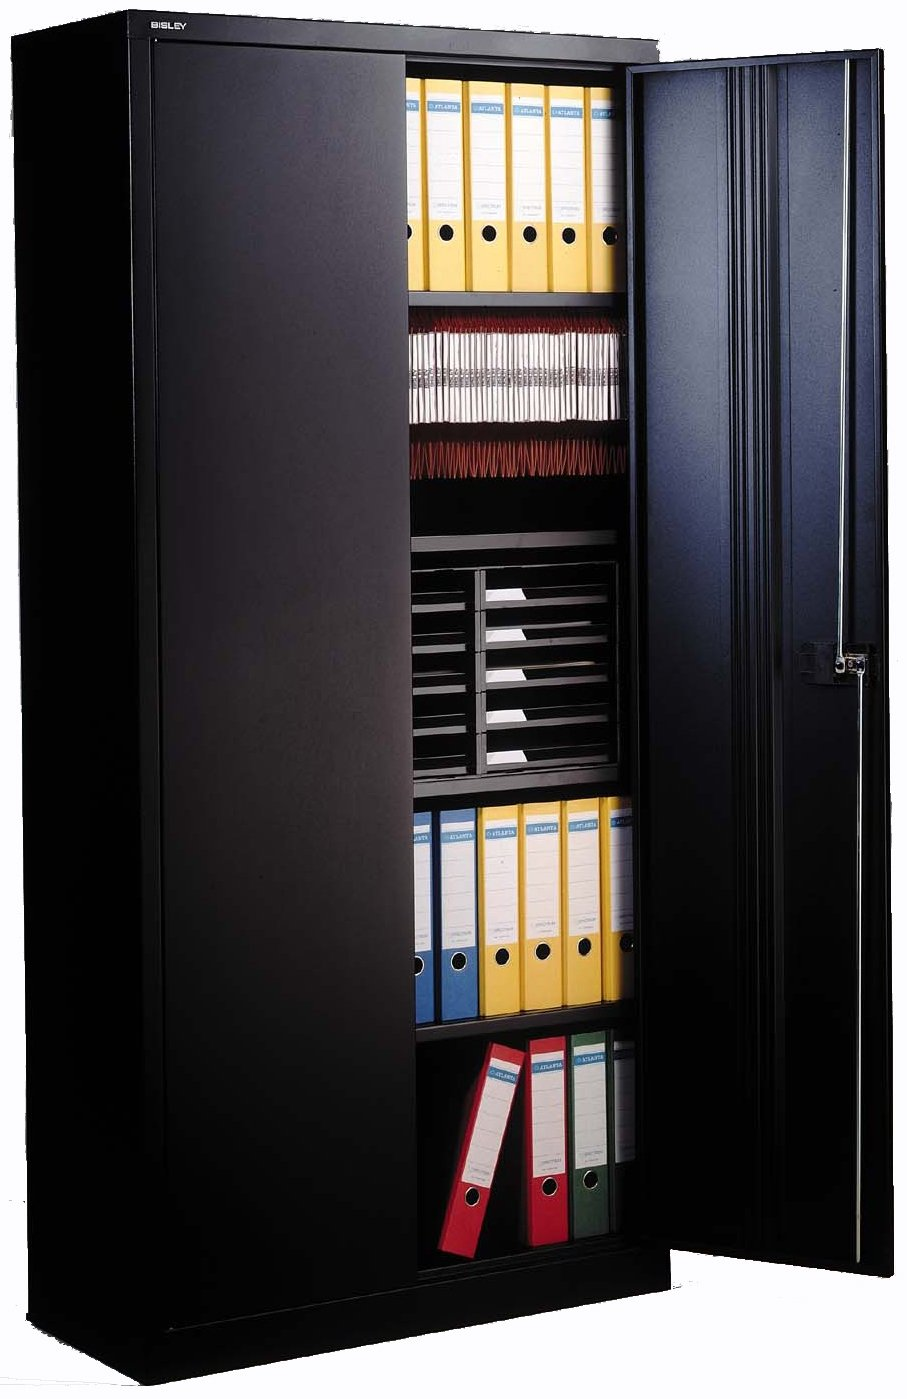 Bisley E782A04 - Büroschrank - 4 Borde - 2 Türen - Schwarz: Amazon ...